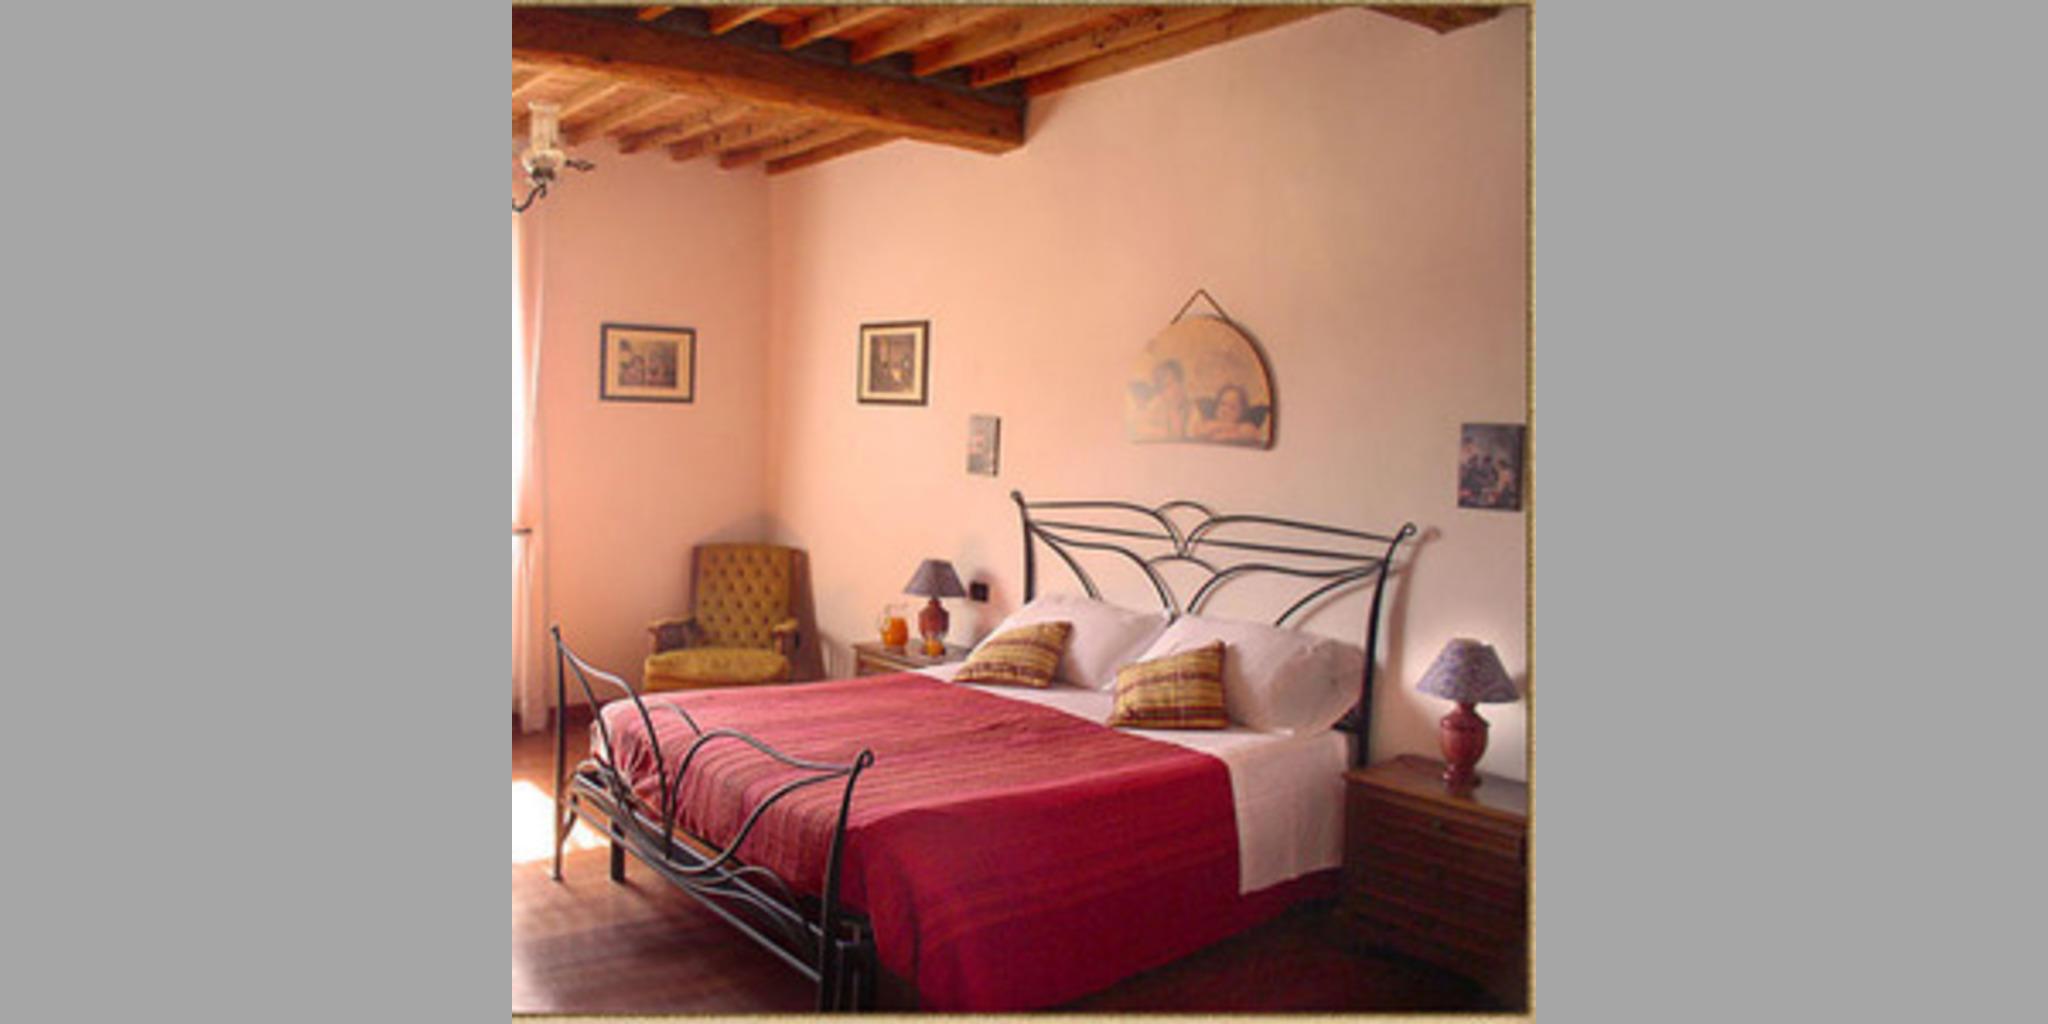 Bed & Breakfast Calci - Eugenio Iii